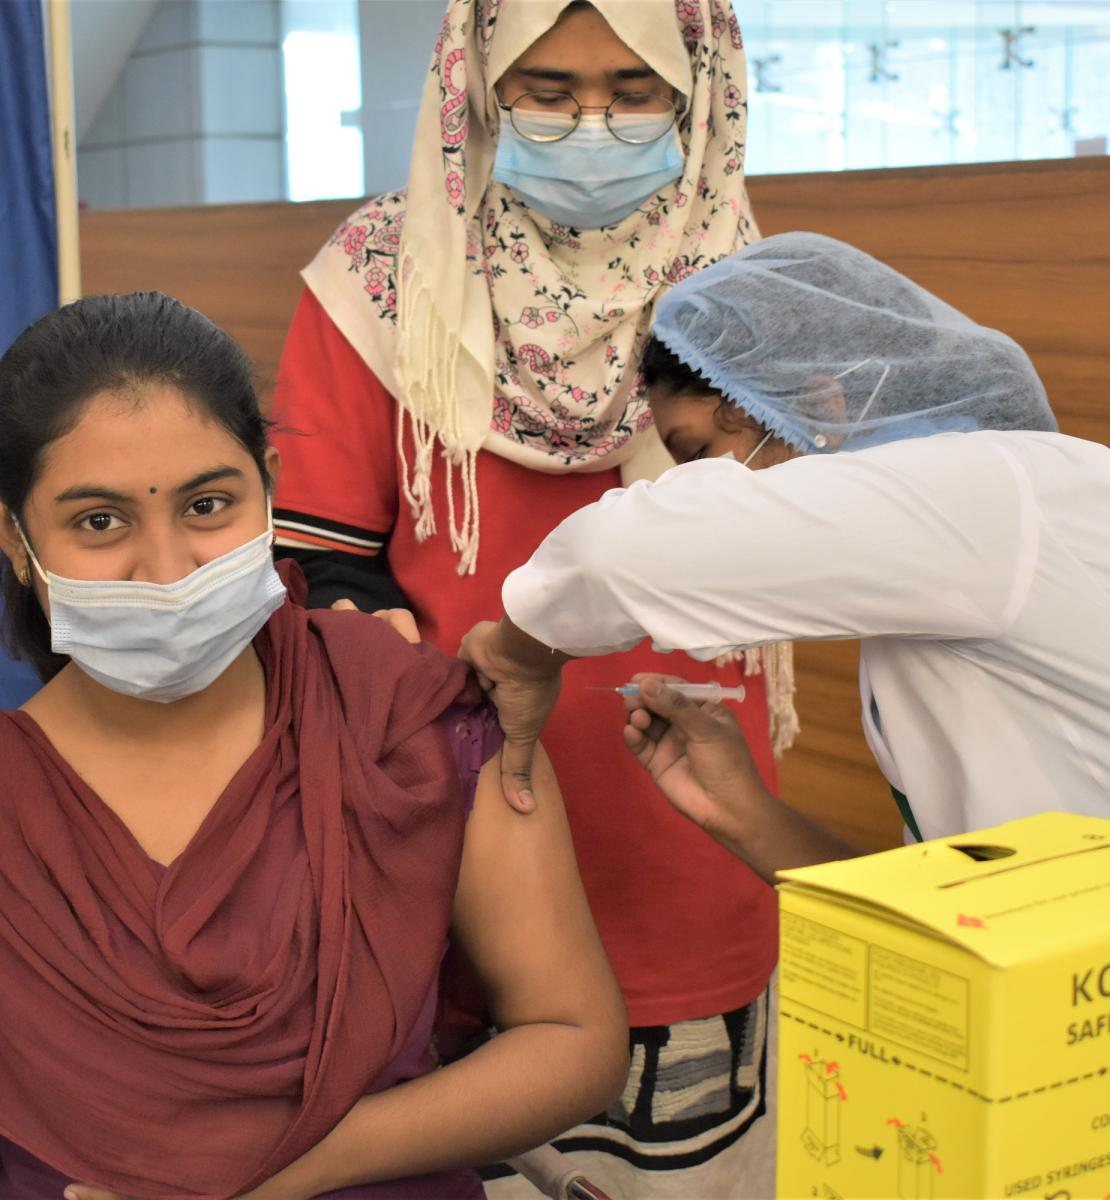 Frontline health worker receiving COVID-19 vaccine at Bangabandhu Sheikh Mujib Medical University Hospital (BSMMU).